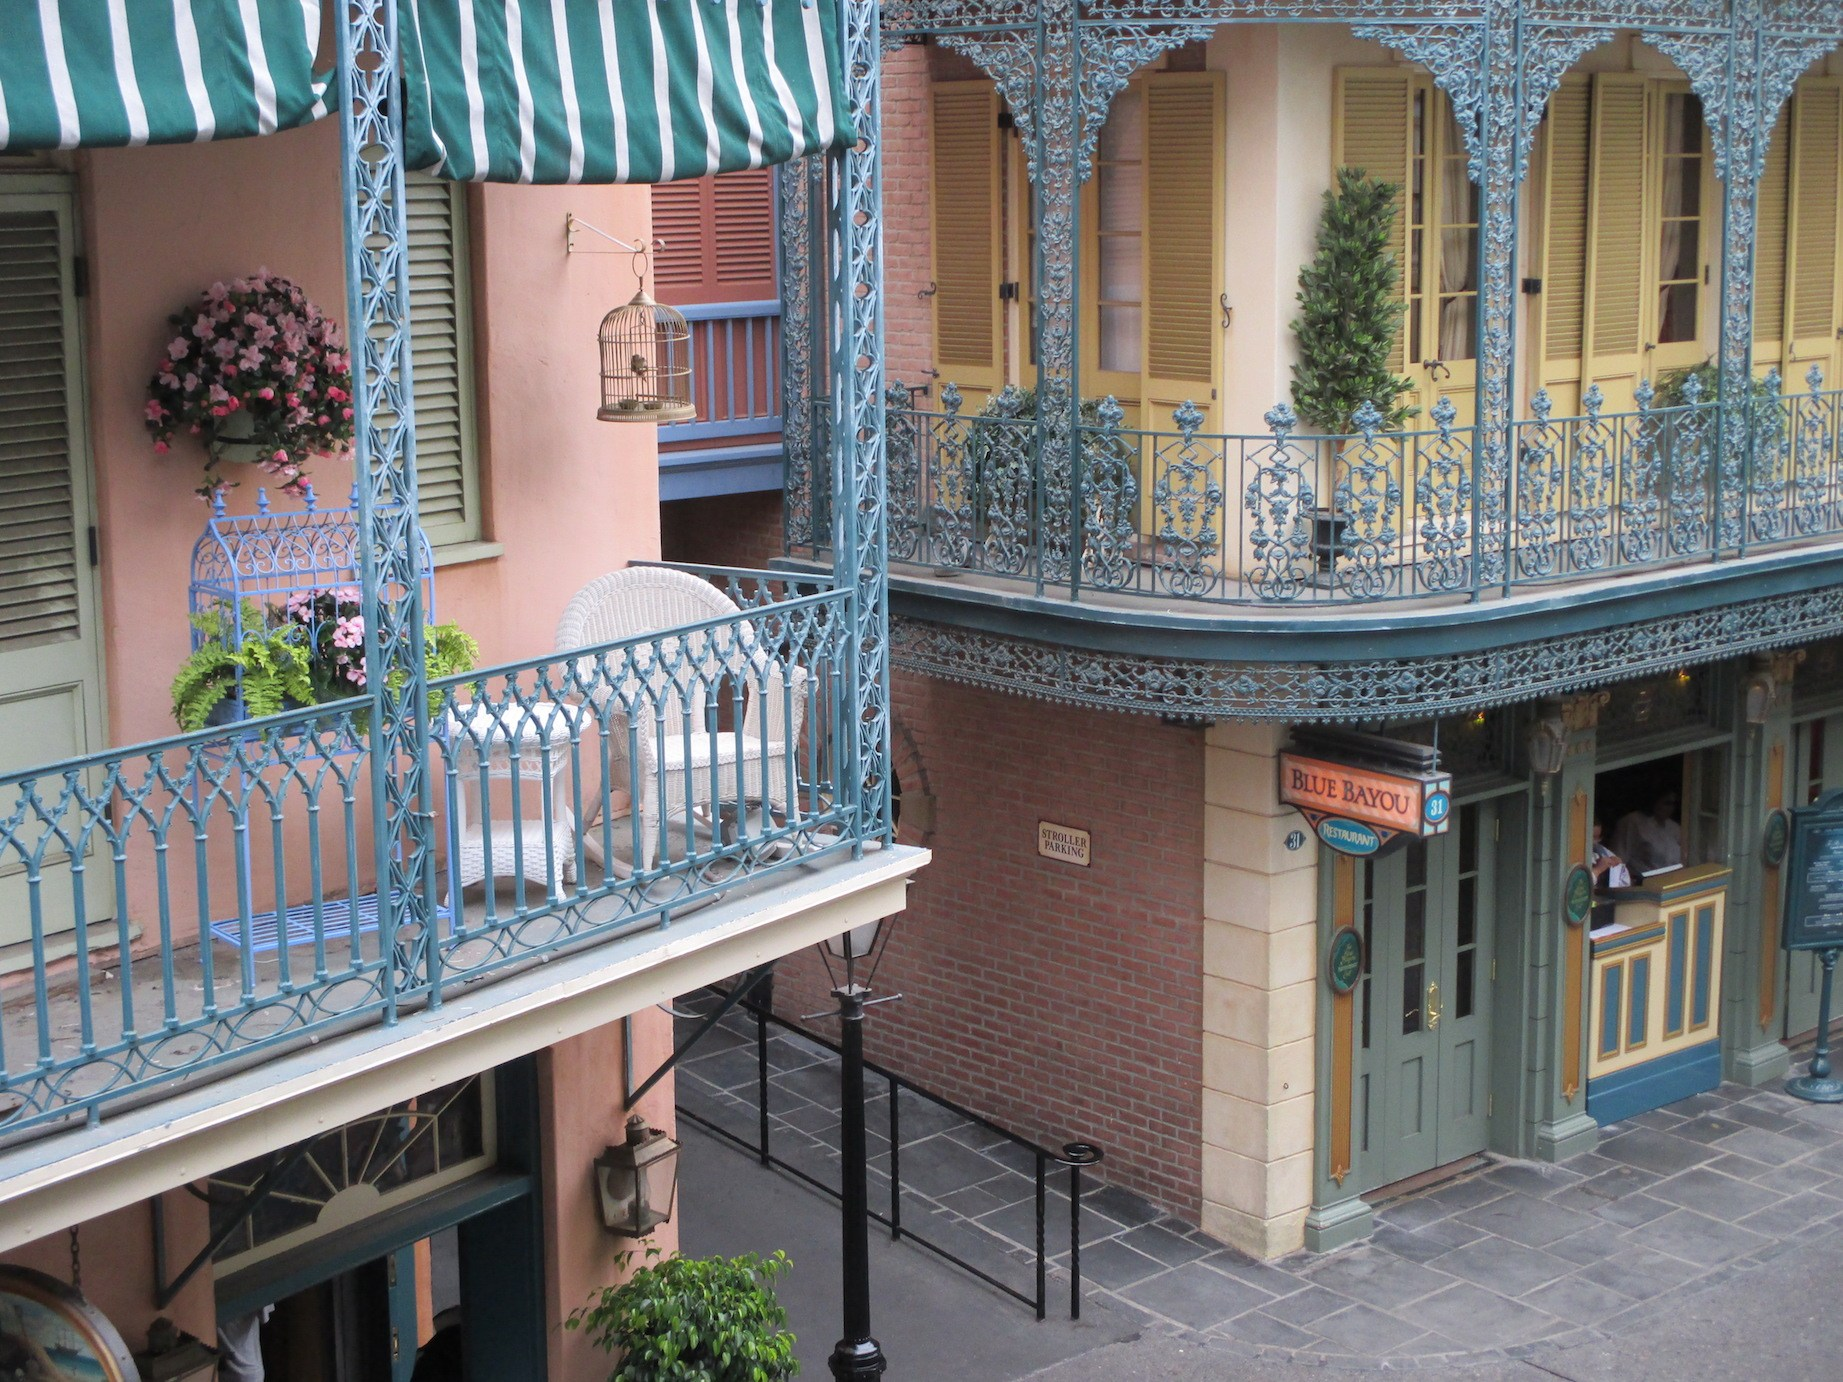 Disneyland New Orleans Square balcony